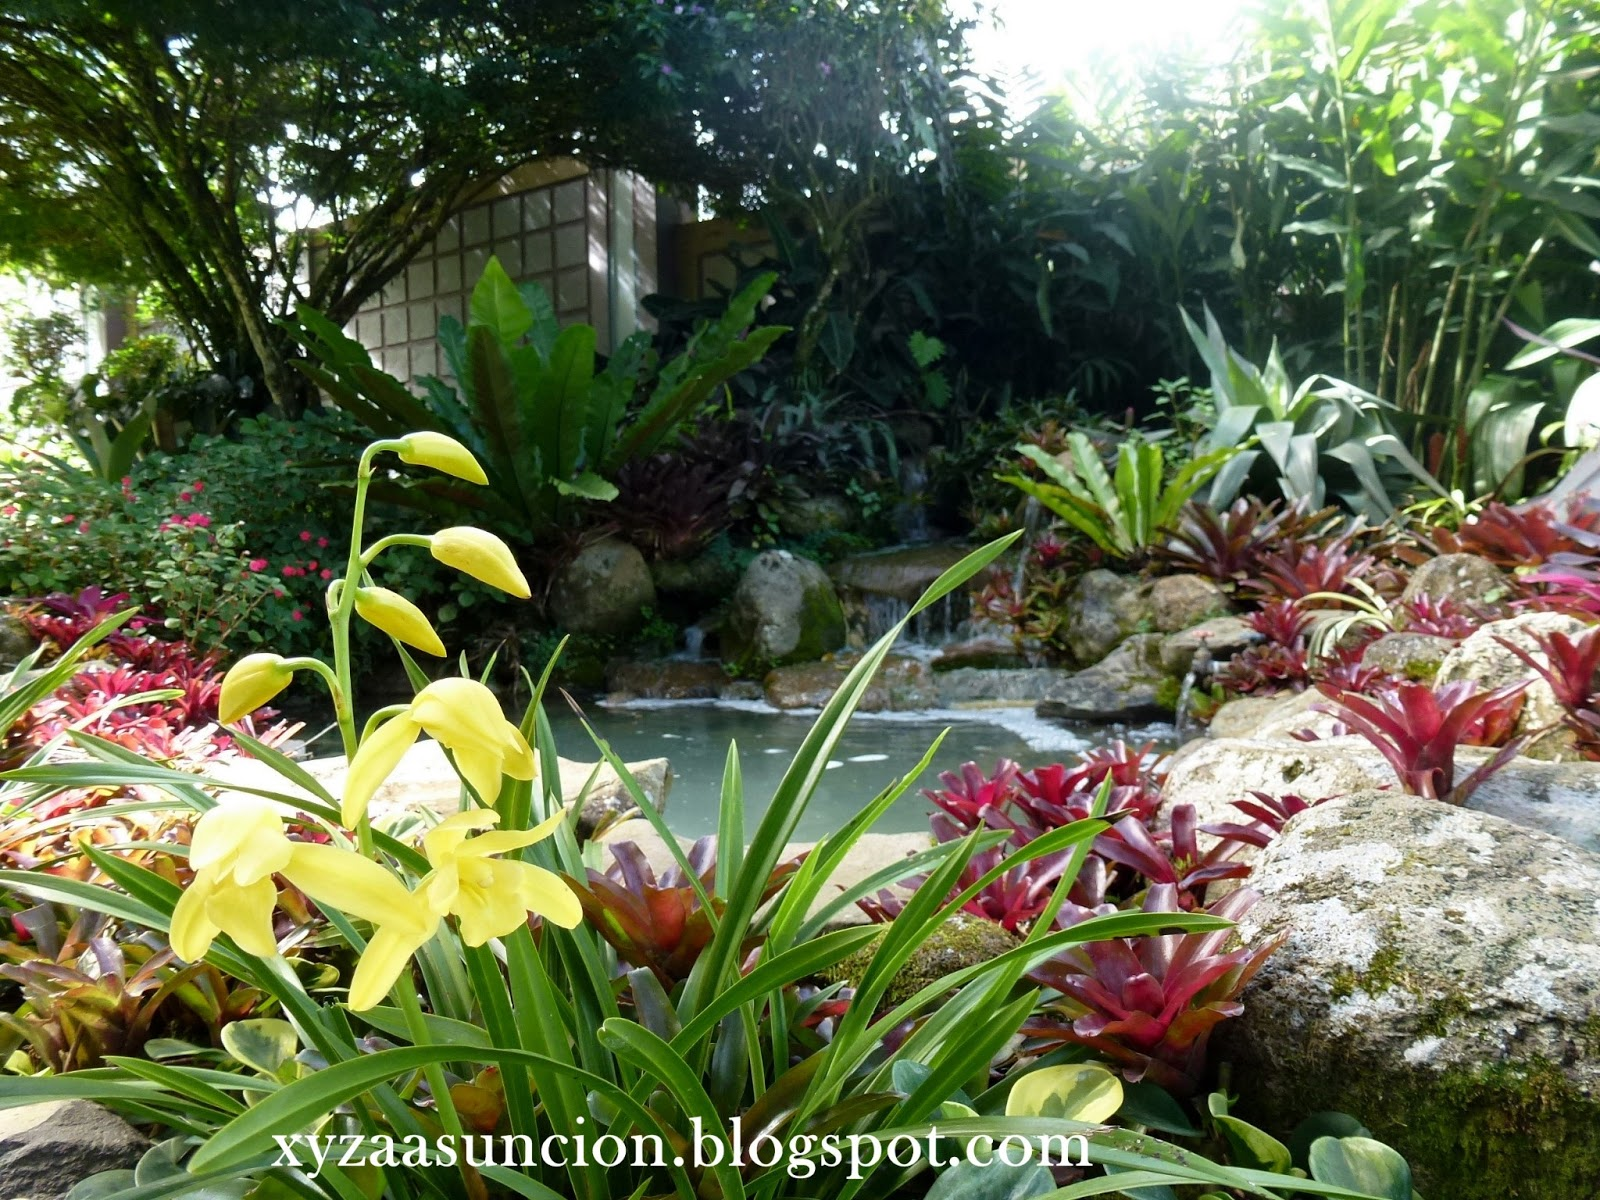 Wanderlust The Garden Of Eden Restored